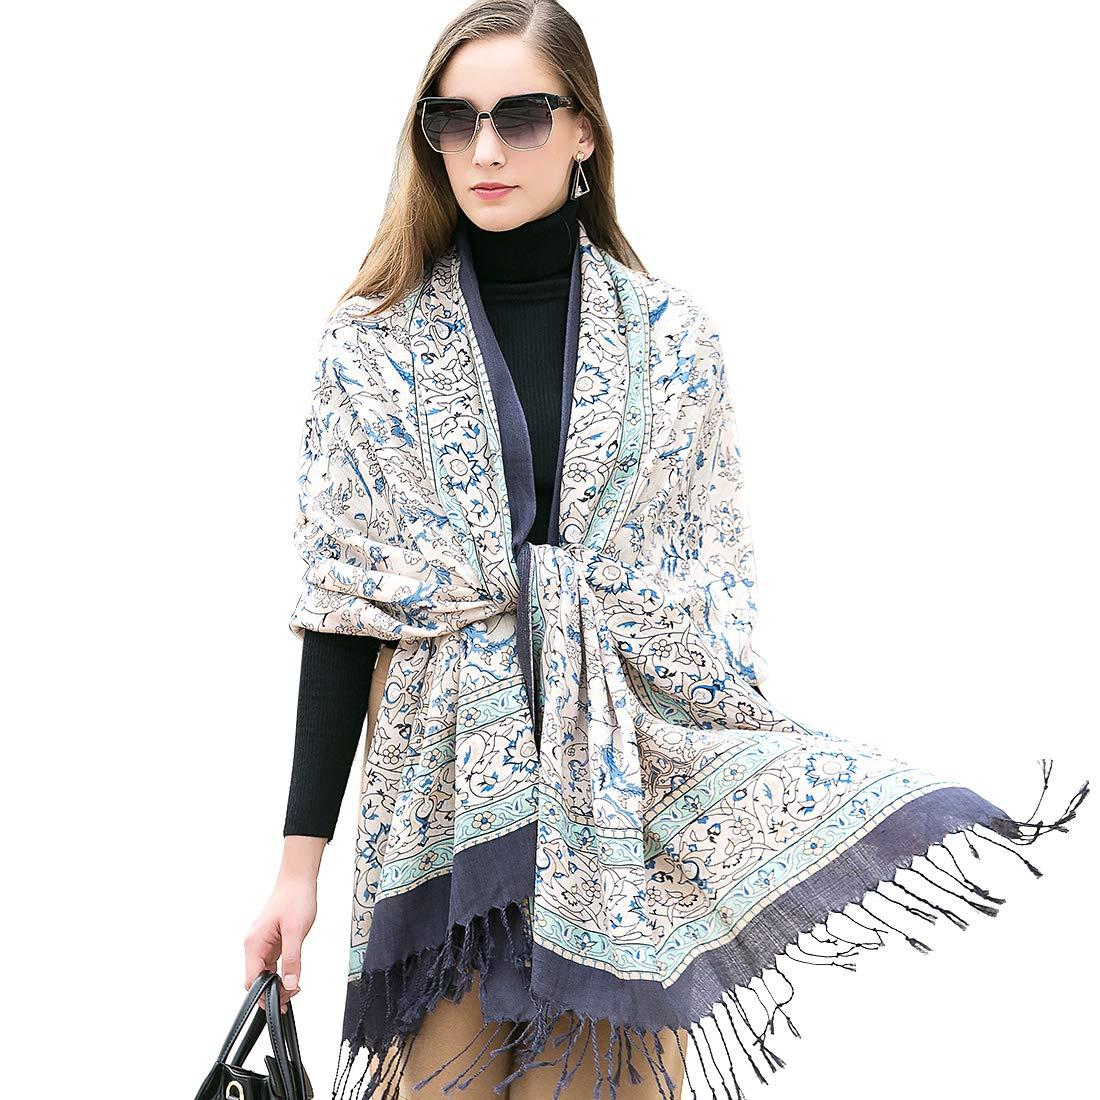 DANA XU 100% Pure Wool Women Winter Large Size Pashmina Travel Shawl (White&Blue) by DANA XU